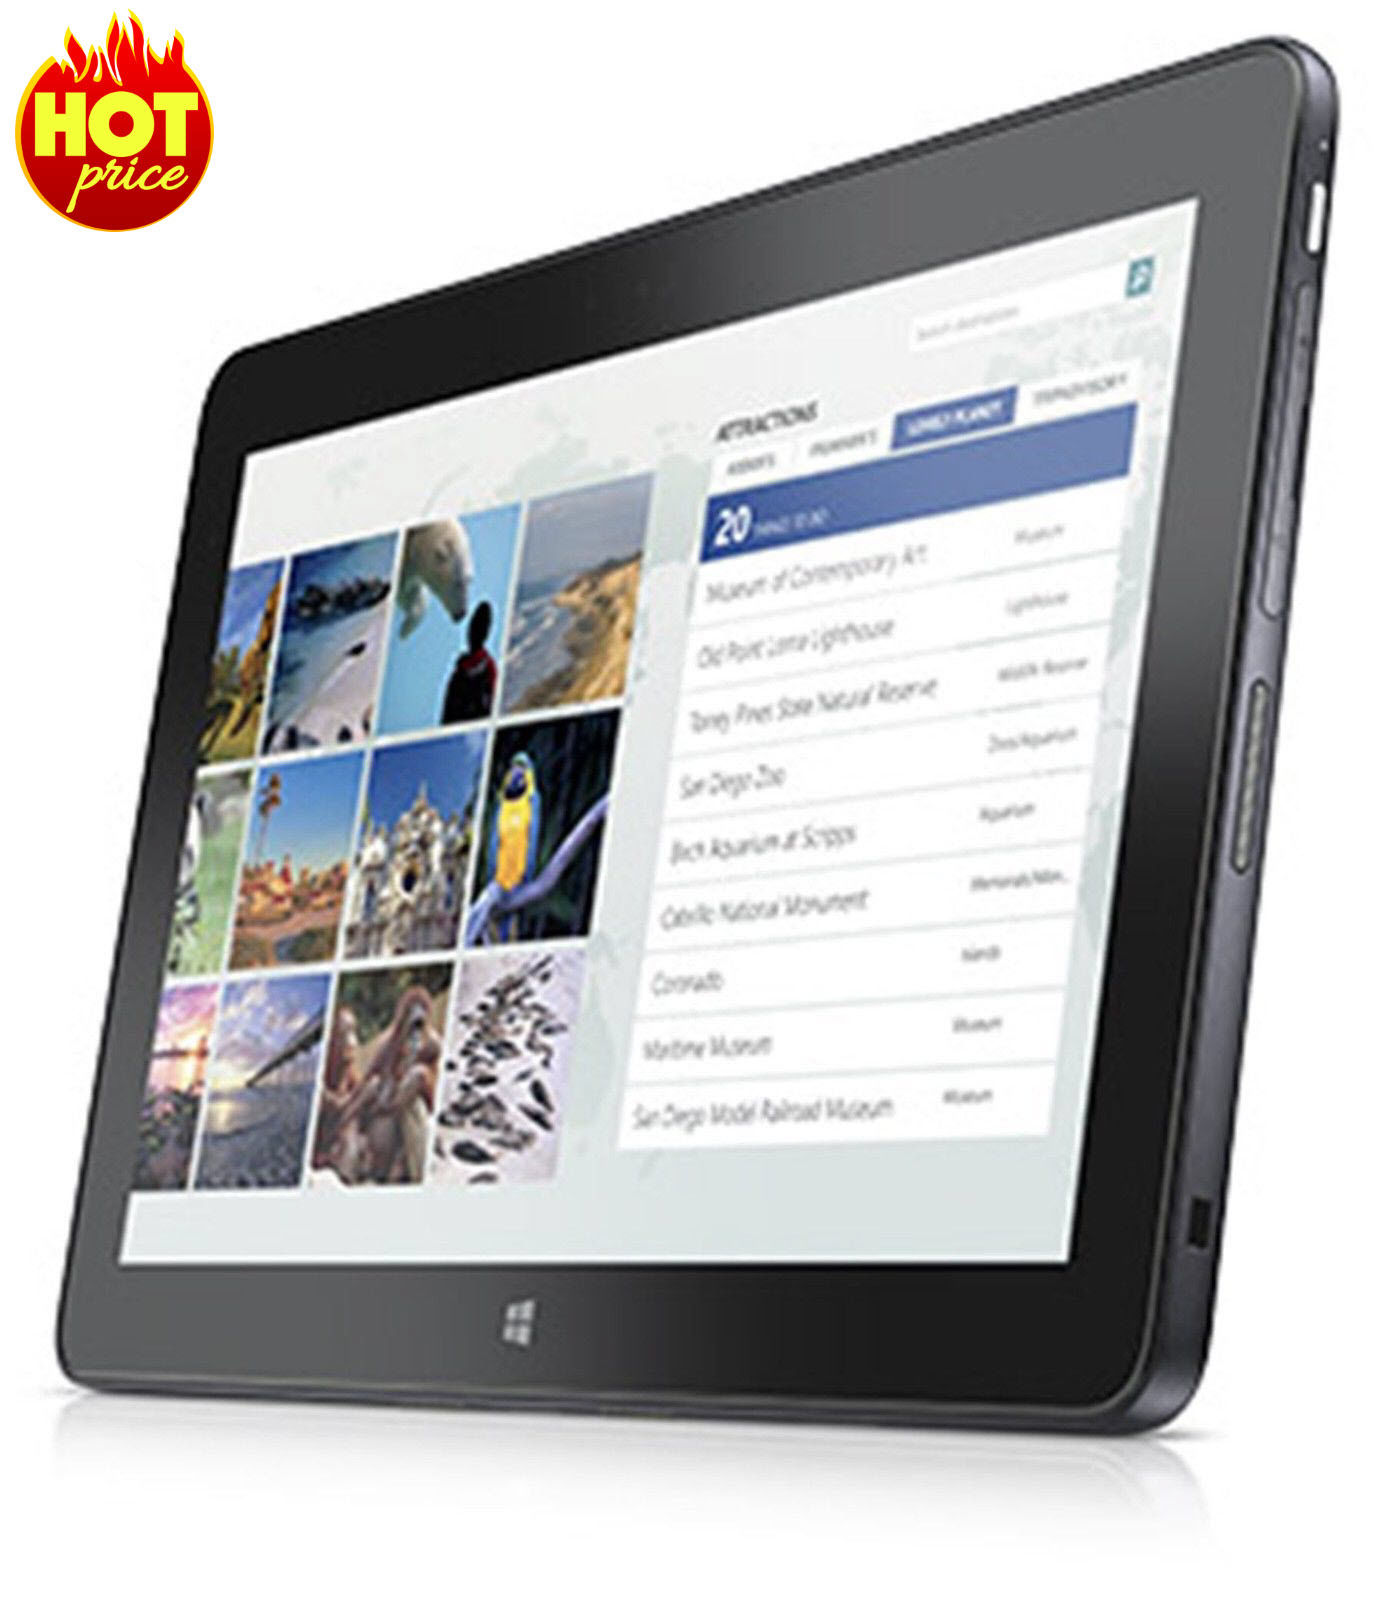 Dell Venue 11 Pro 7140 128GB SSD WLAN WWAN FULL HD IPS WINDOWS 10 TABLET, 4G LTE